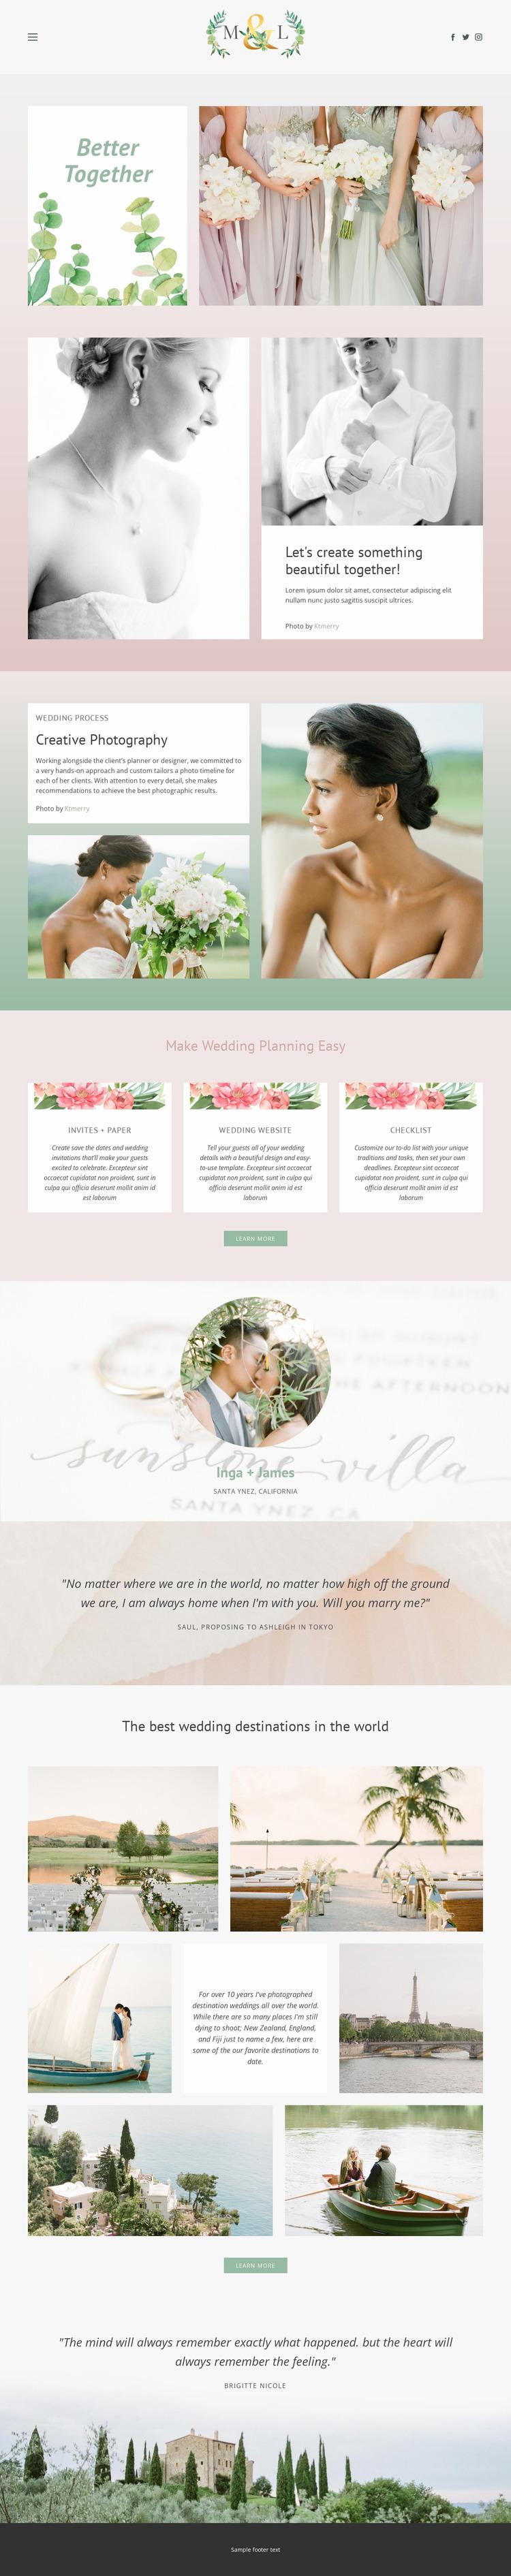 Best photos for wedding WordPress Website Builder